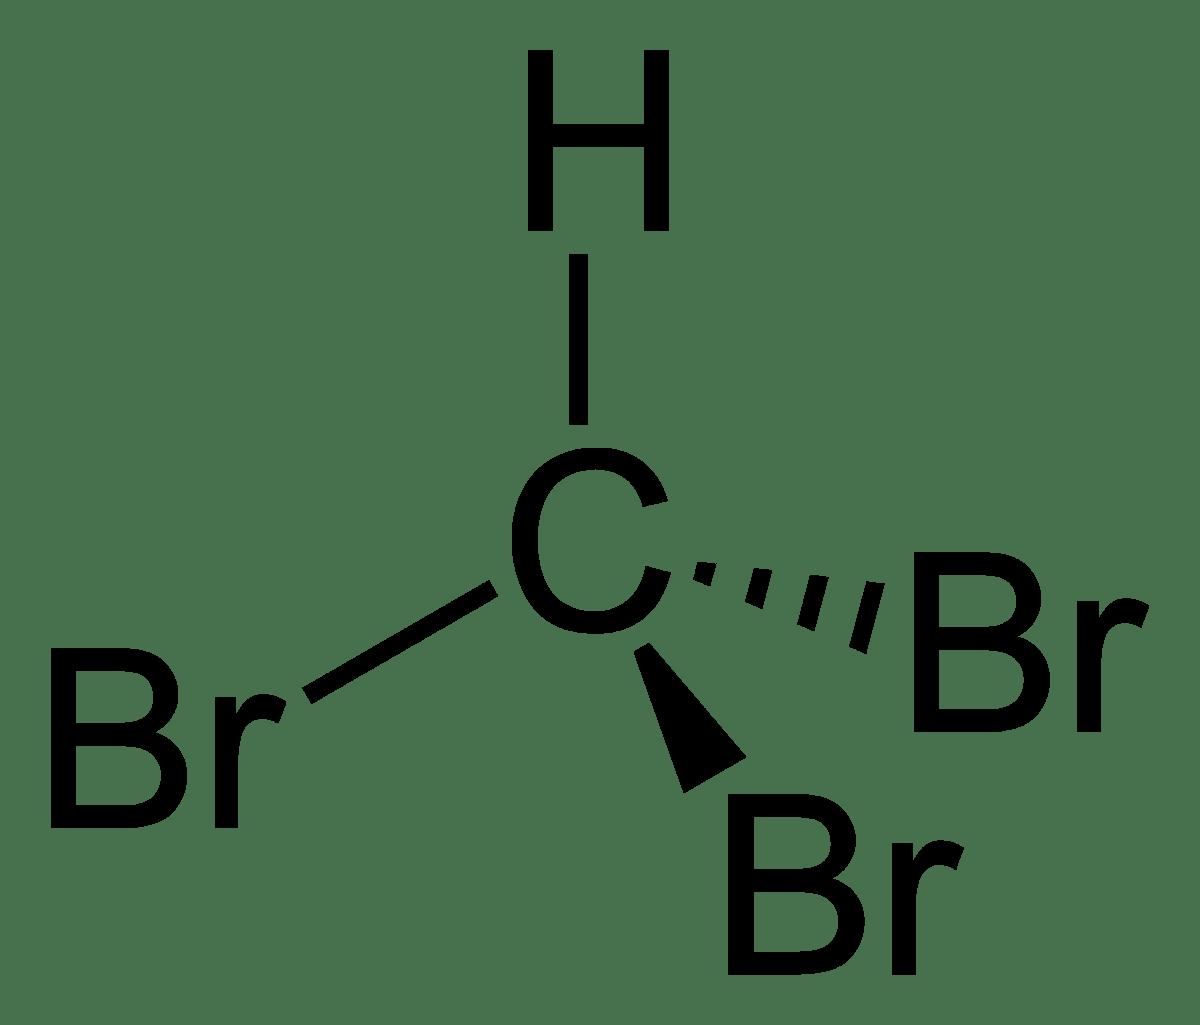 hight resolution of lewis diagram cbr2 wiring diagram lewis diagram chbr3